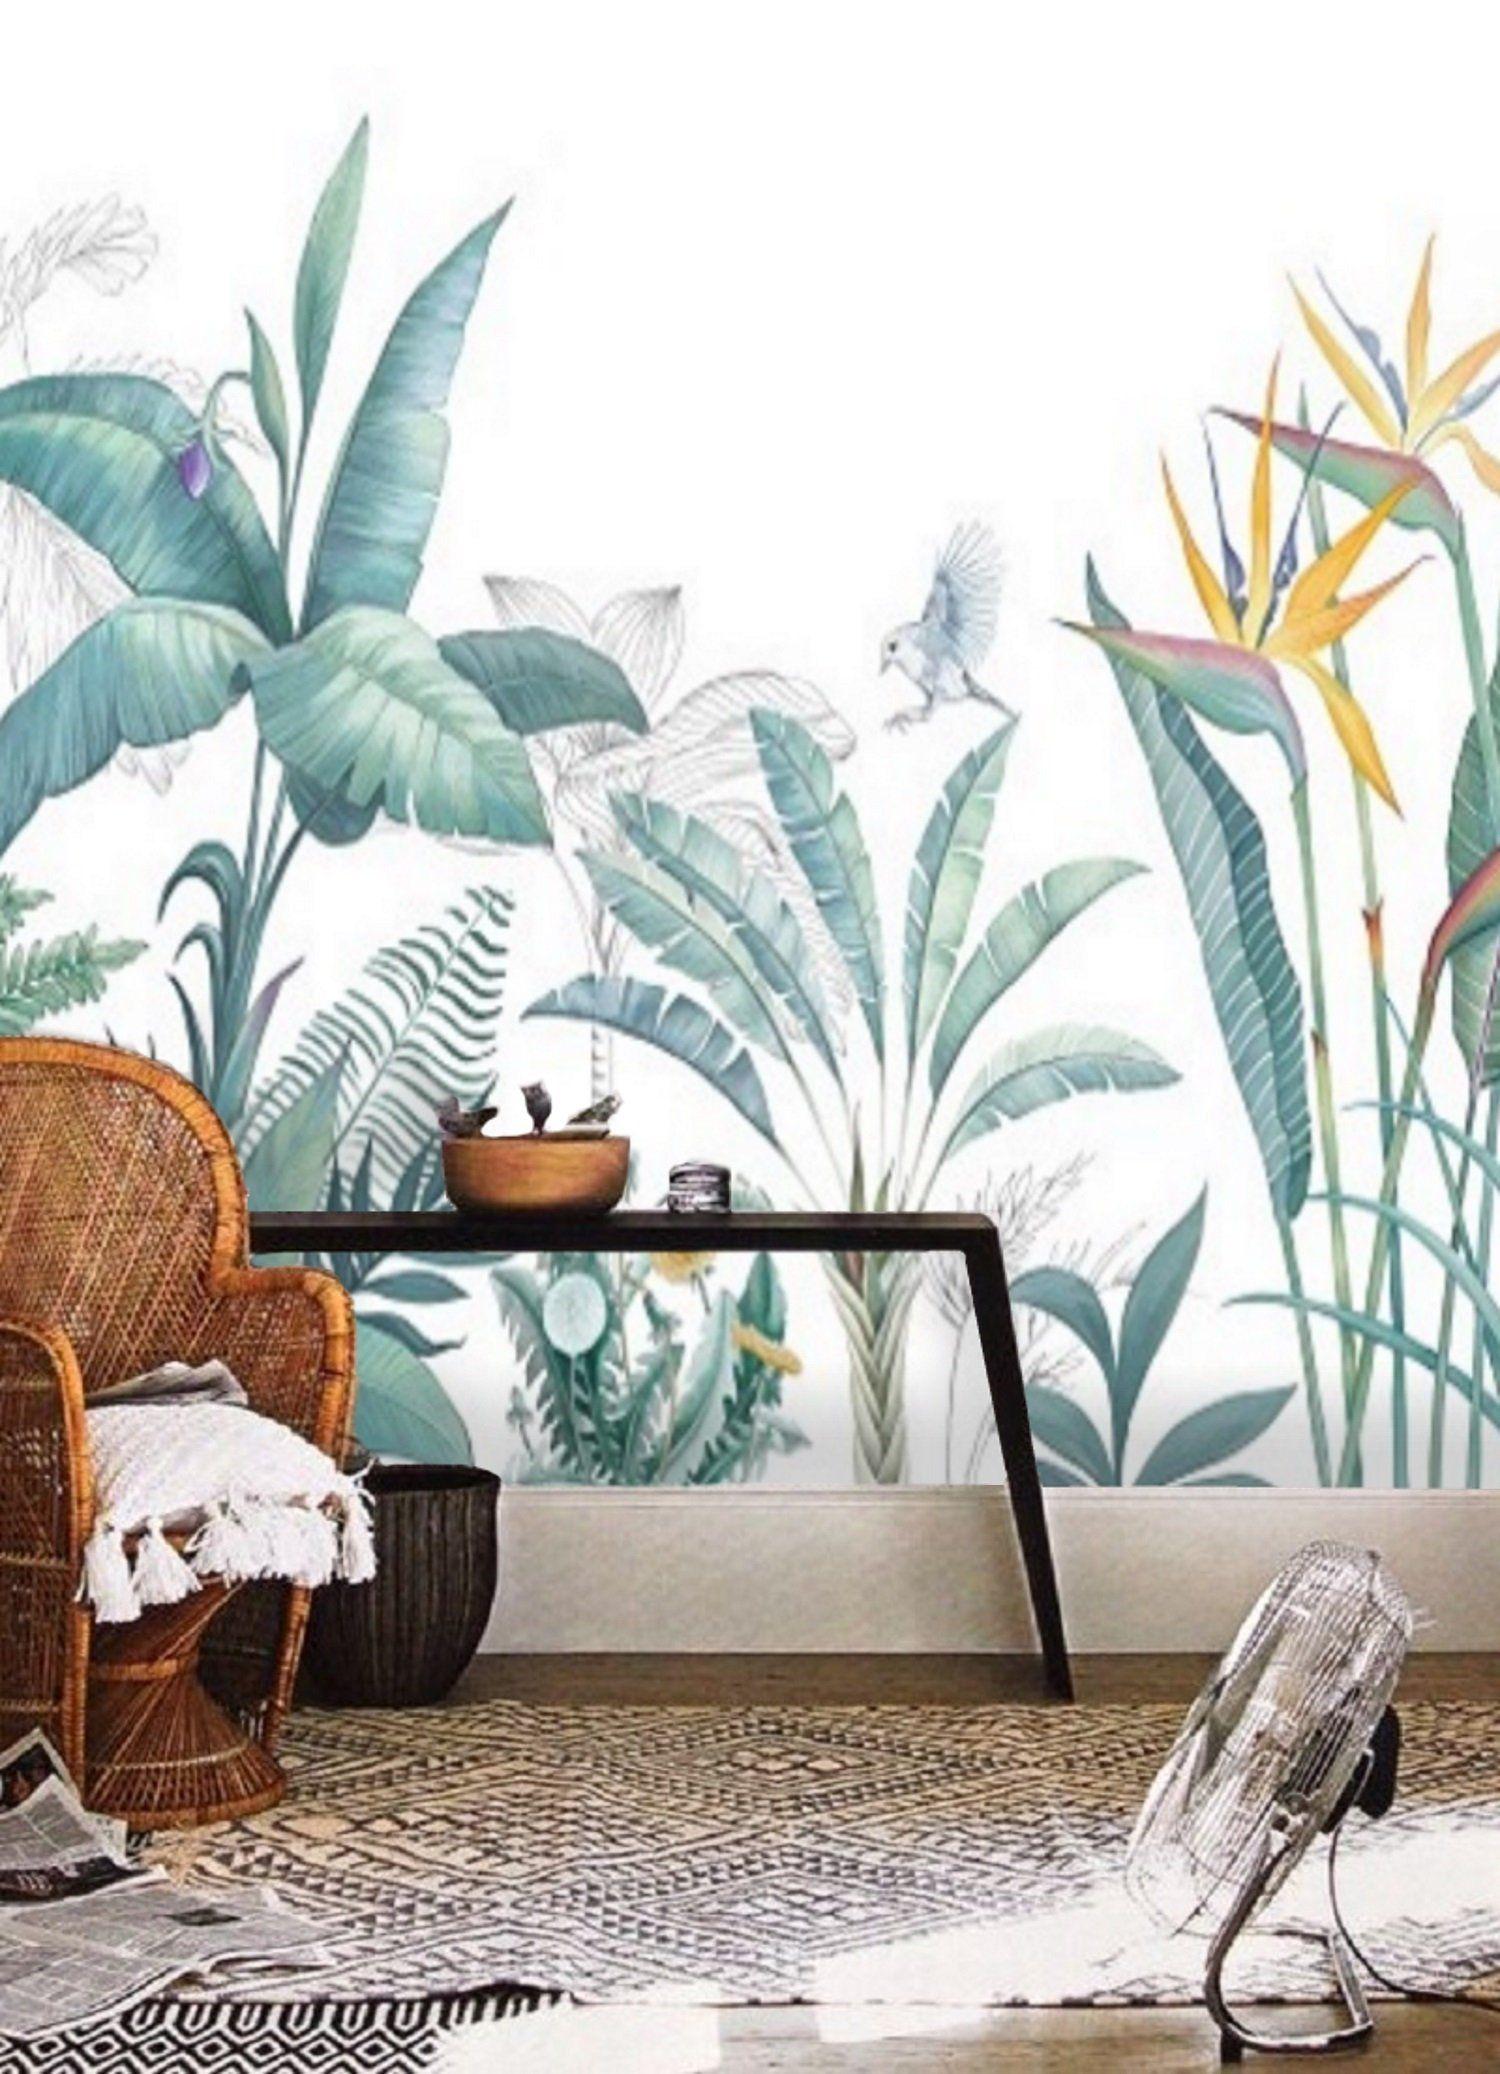 Peel 'n Stick Wall Paper Jungle Mural Removable Wallpaper